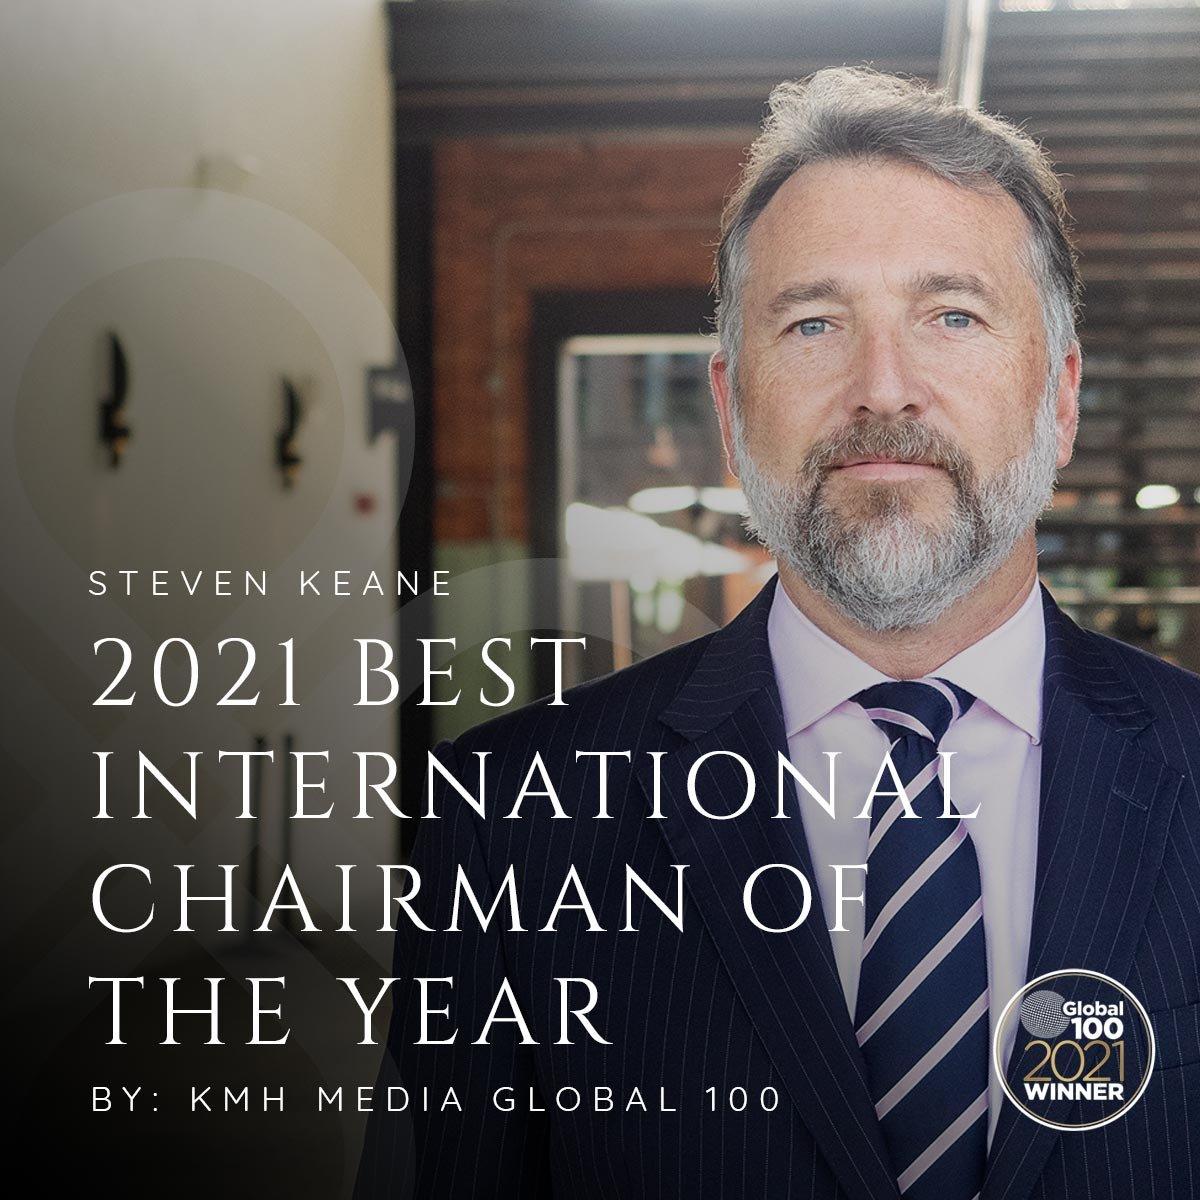 Global_100_social